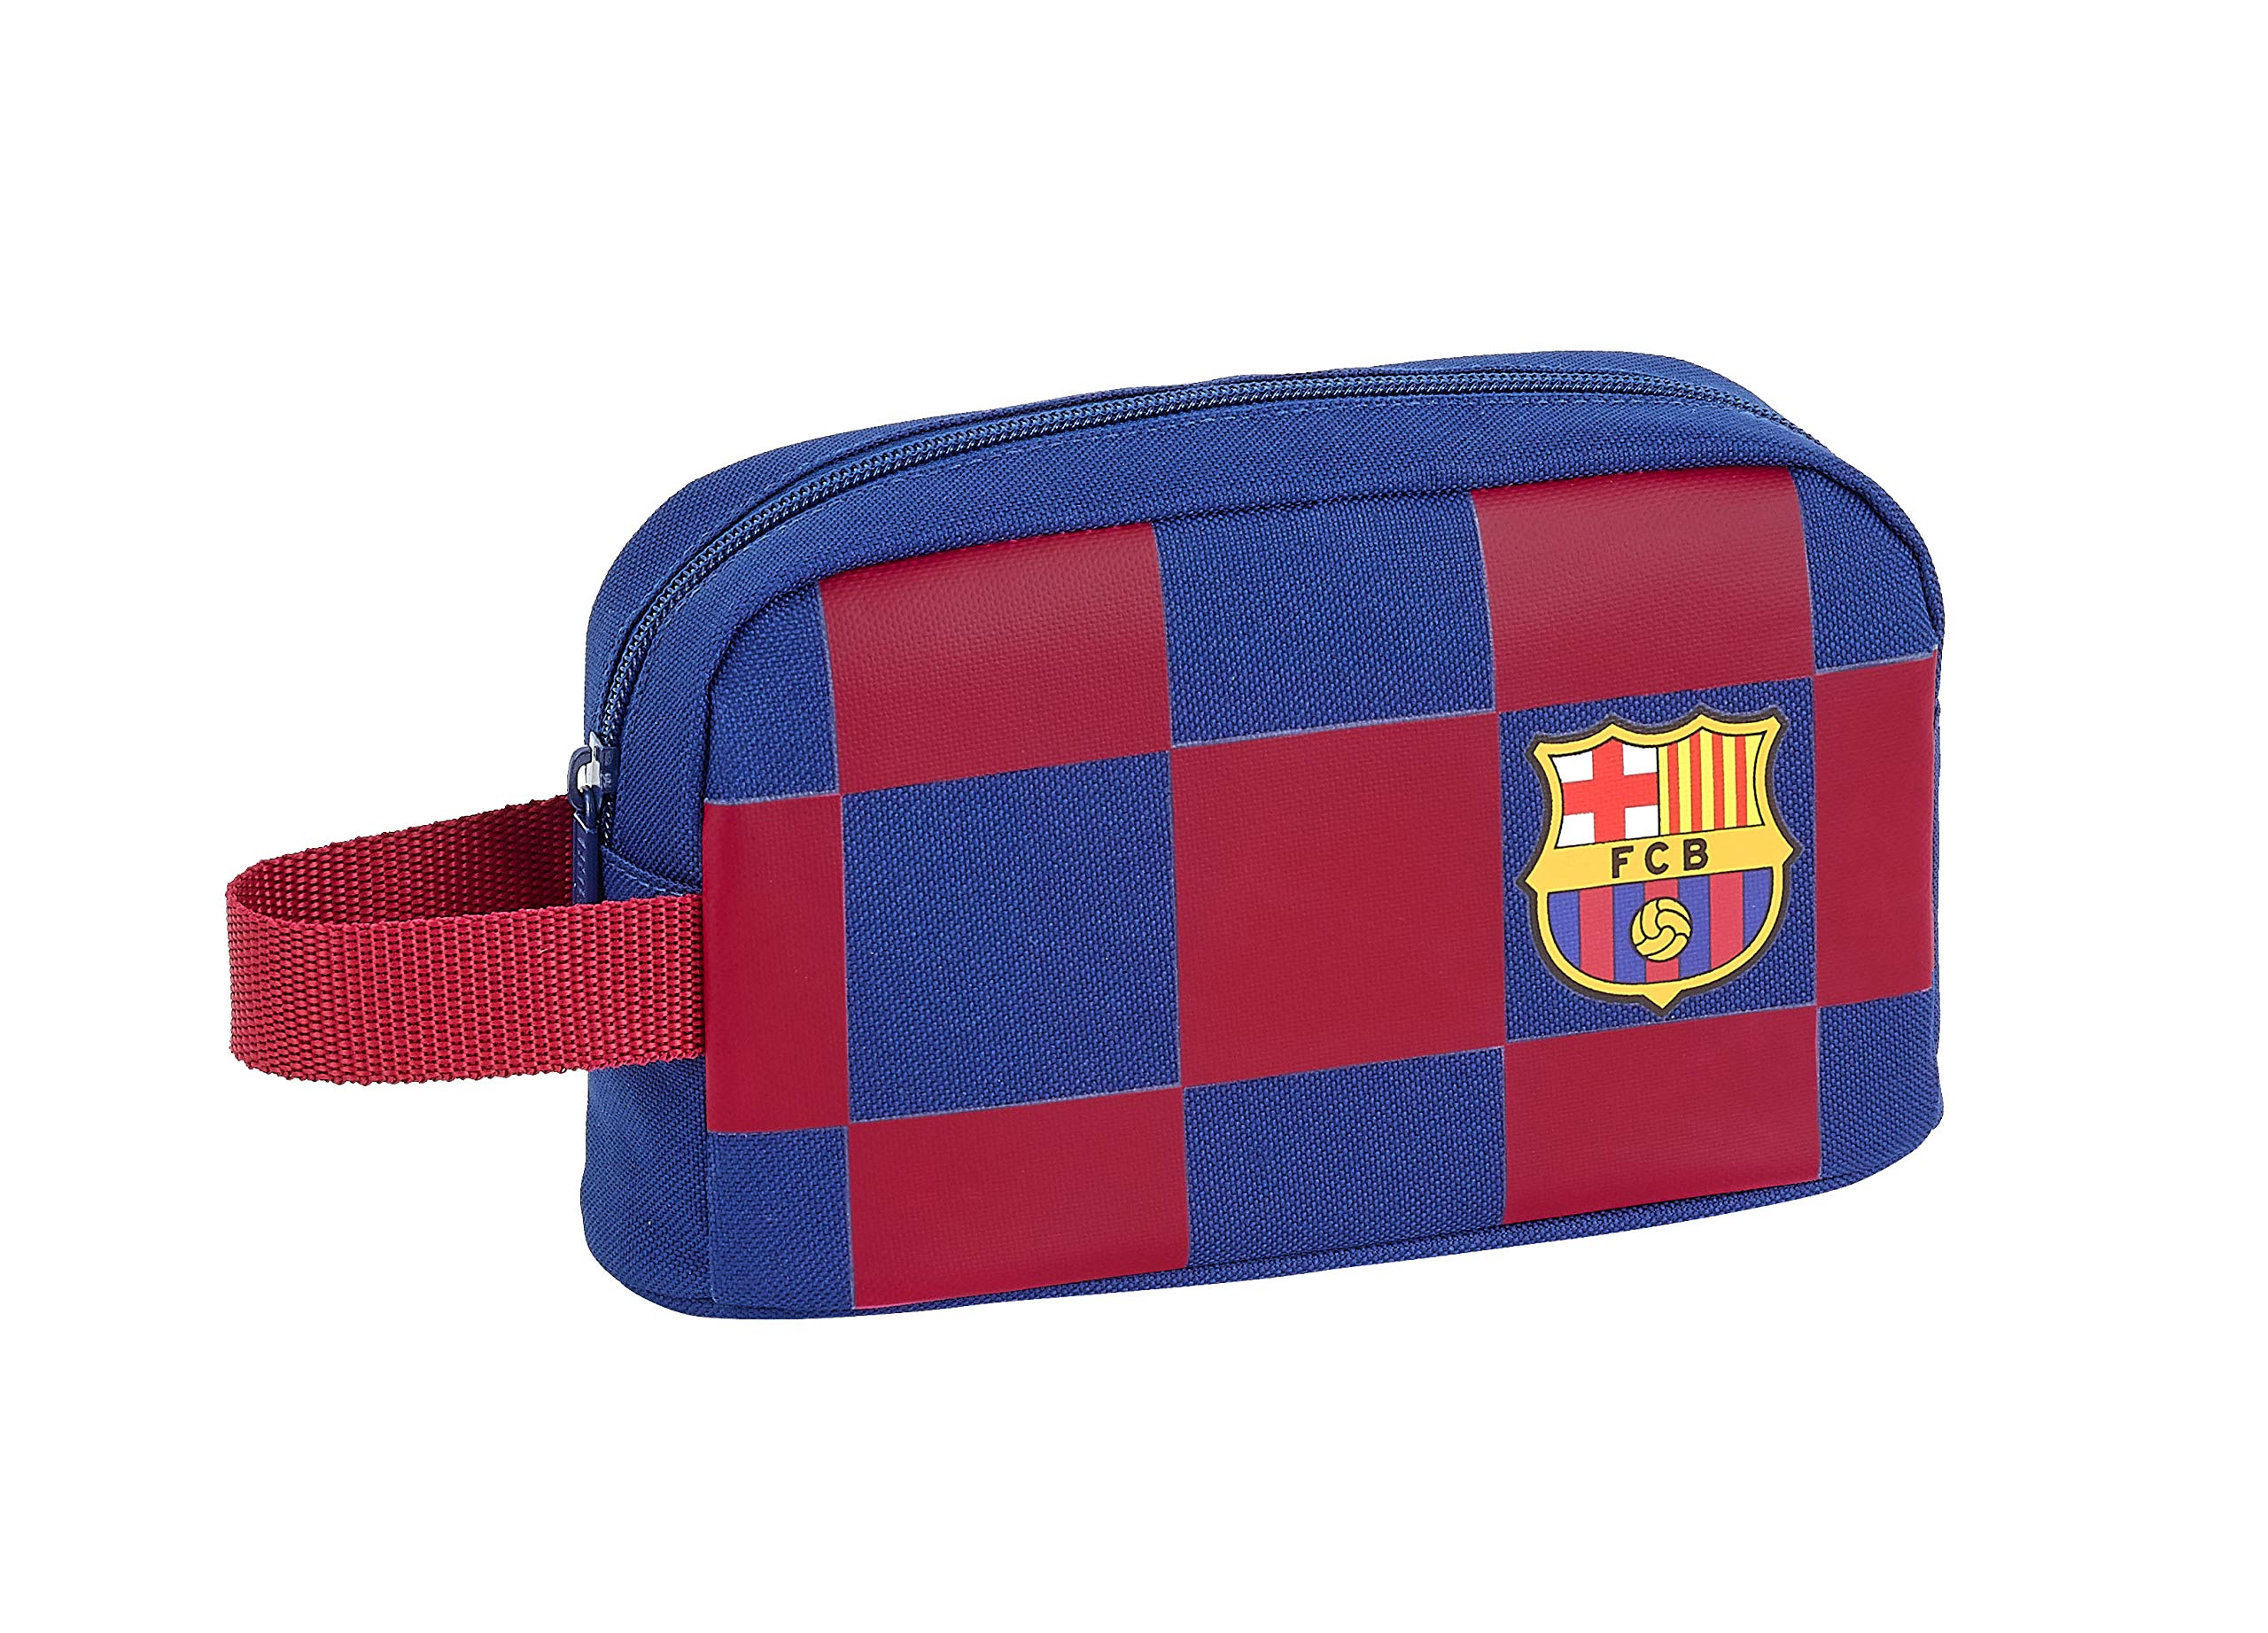 FCB FC Barcelona Equipaje, Niños Unisex, Azul Marino